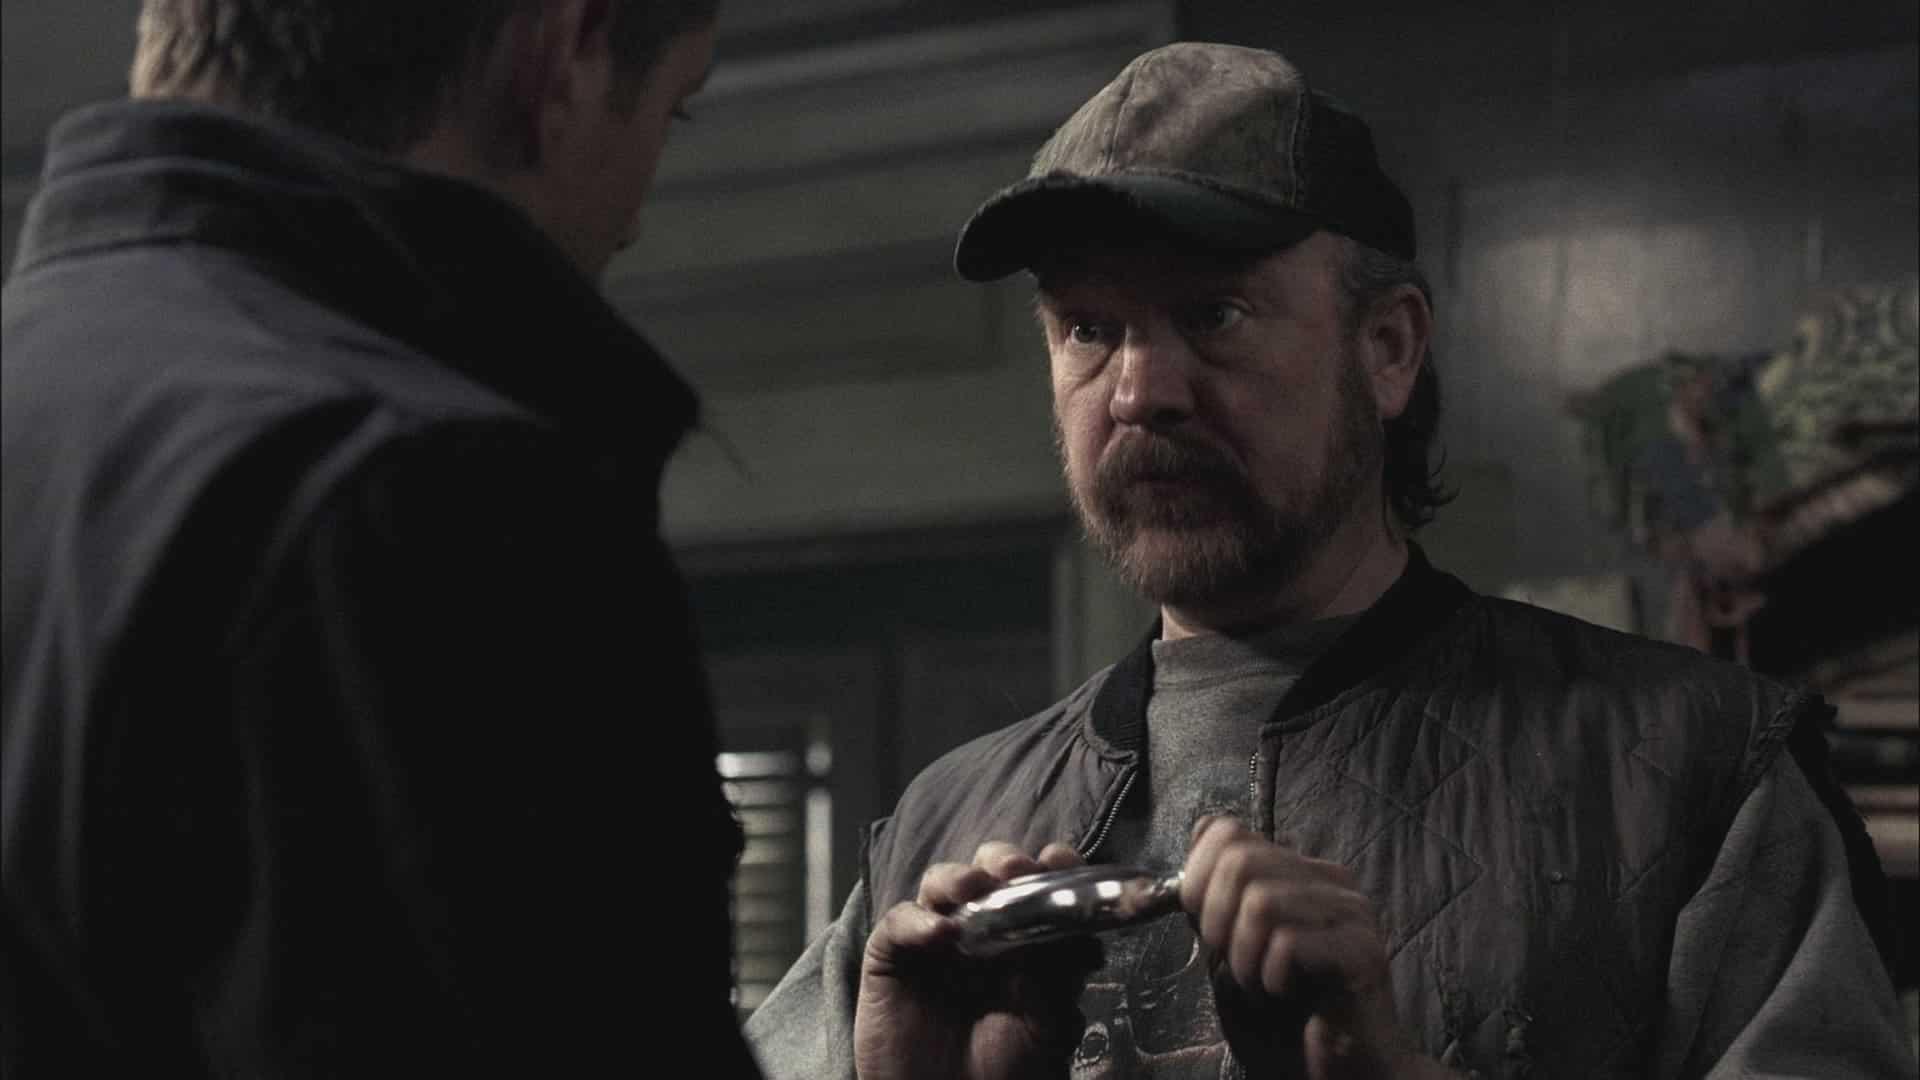 Bobby_Dean_Devils_Trap_1x22